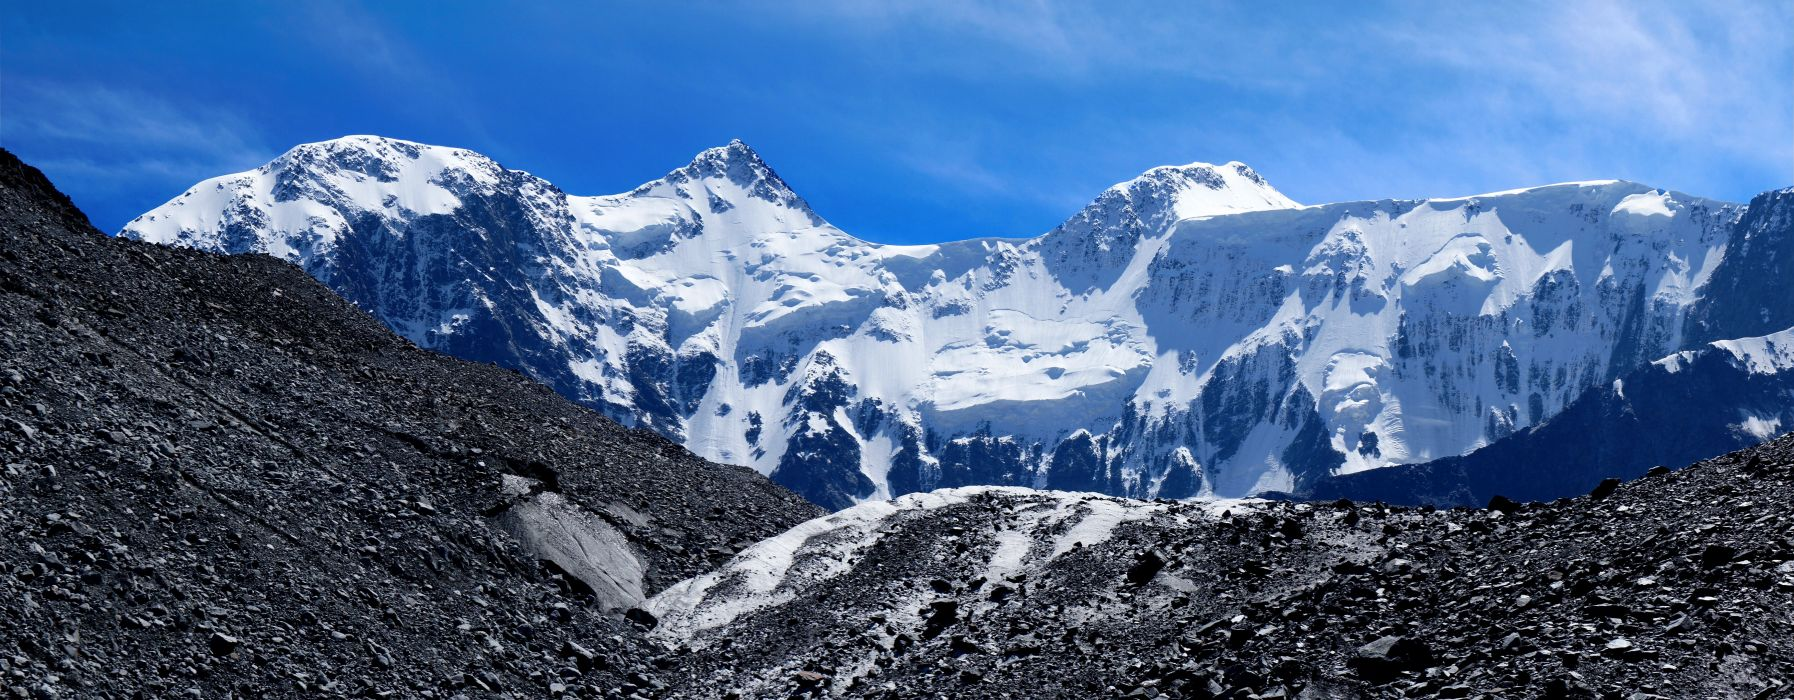 3840×1080 Wallpaper Mountains (78 Wallpapers)